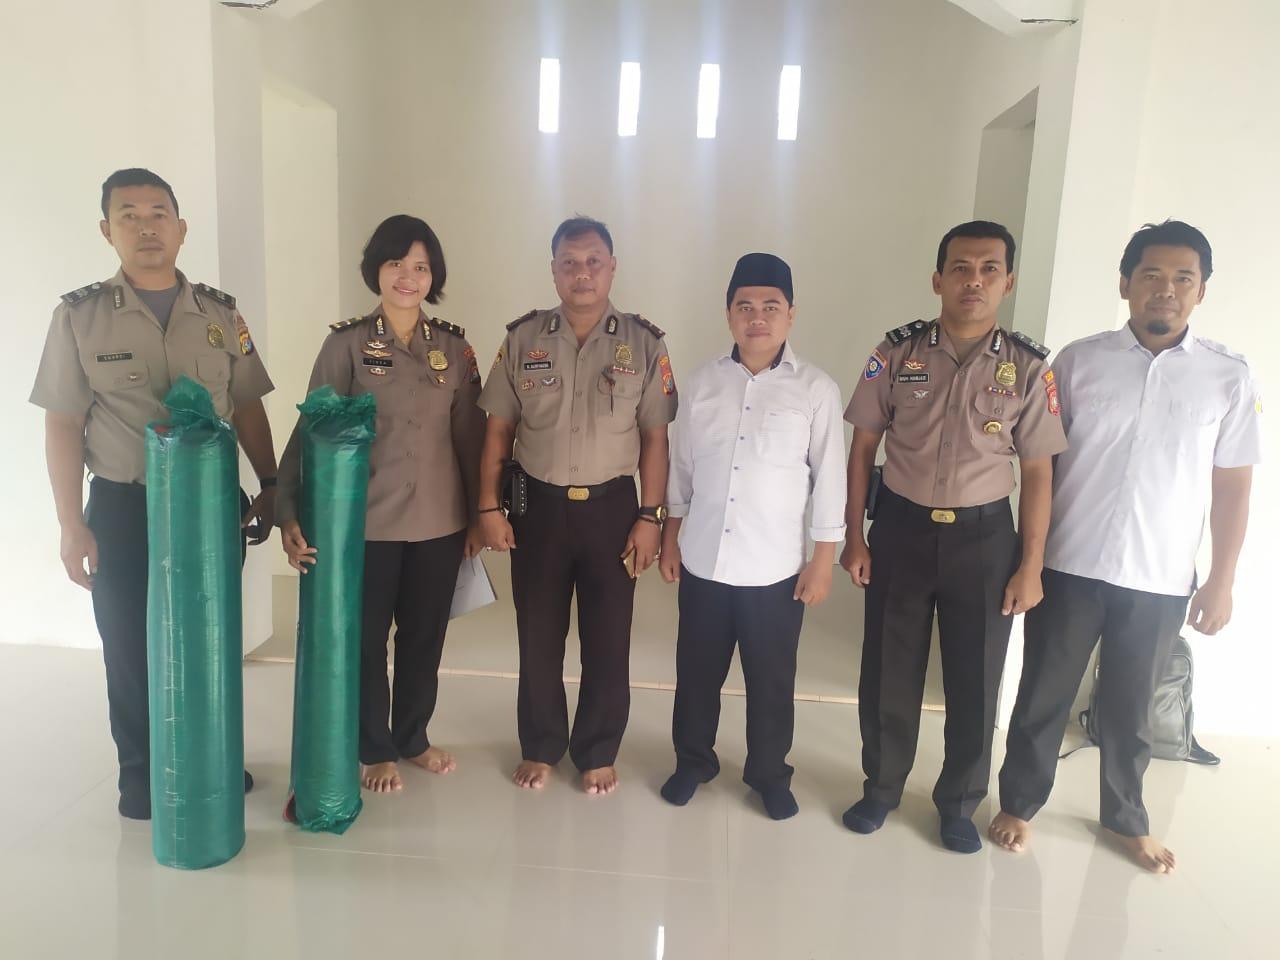 Gambar Satuan Binmas Polres Majene Sumbang Sajadah ke Masjid GLP Lembang